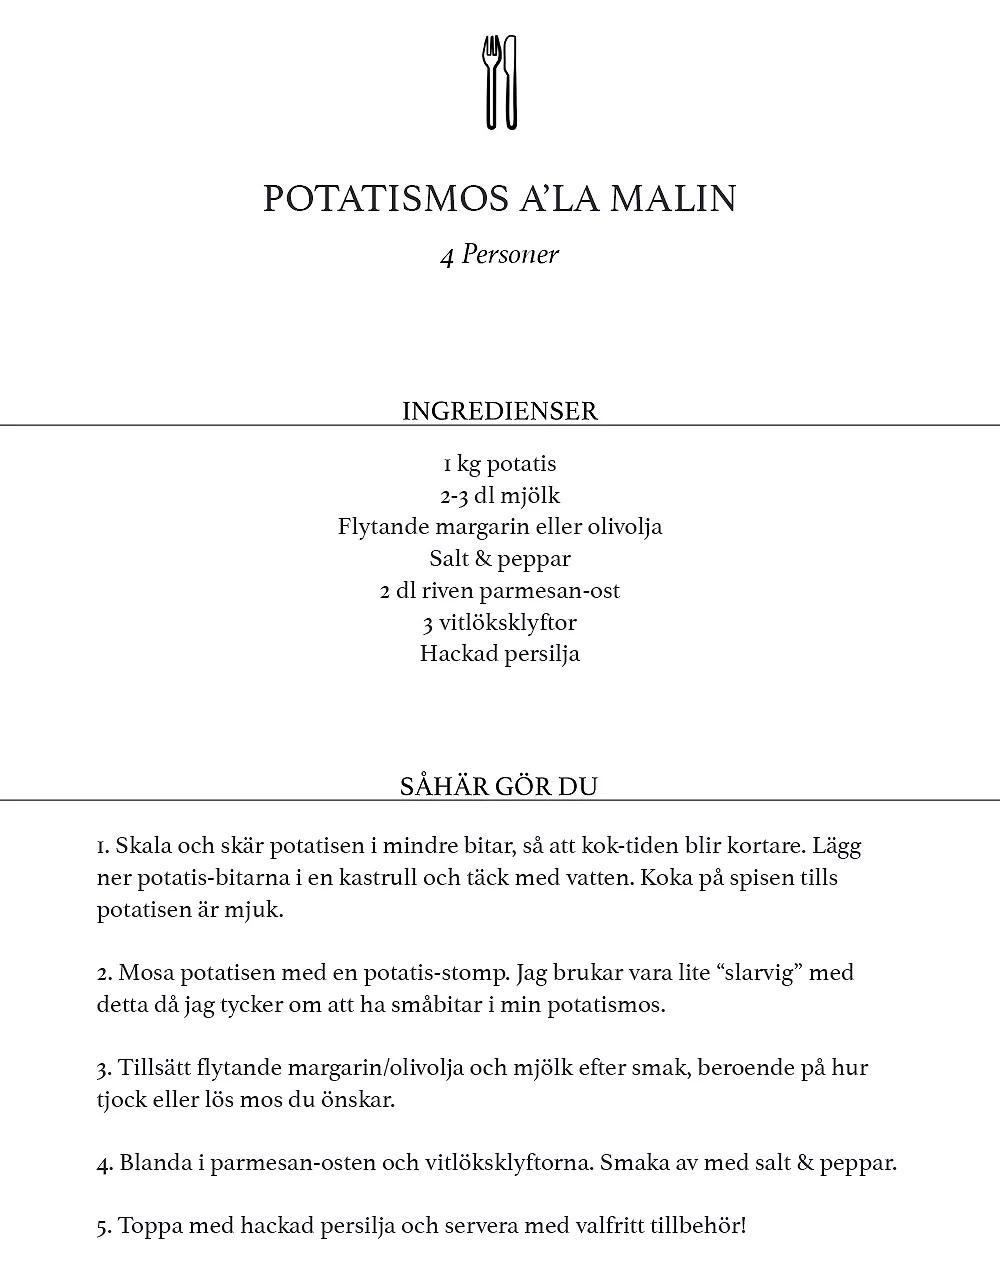 potatismos-a-la-malin